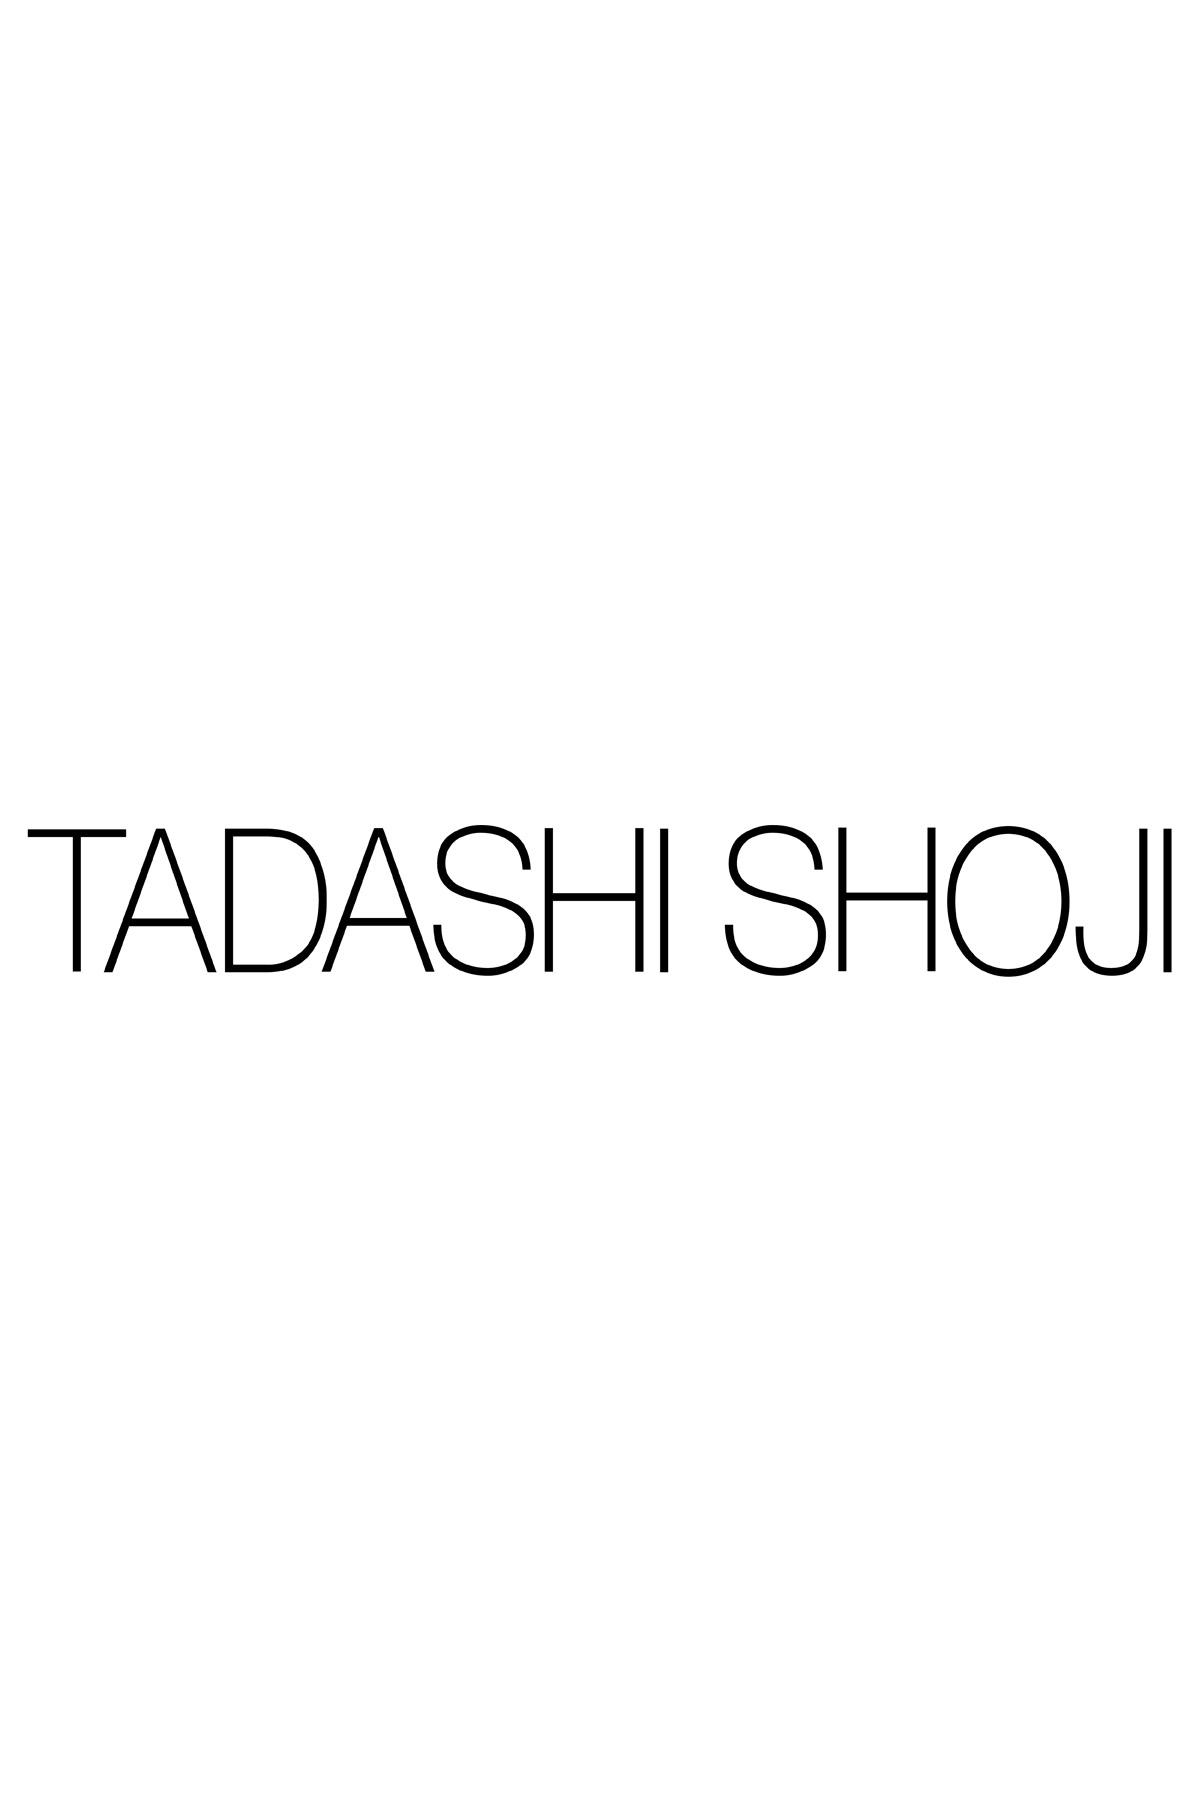 Tadashi Shoji Detail - Clotide Gown